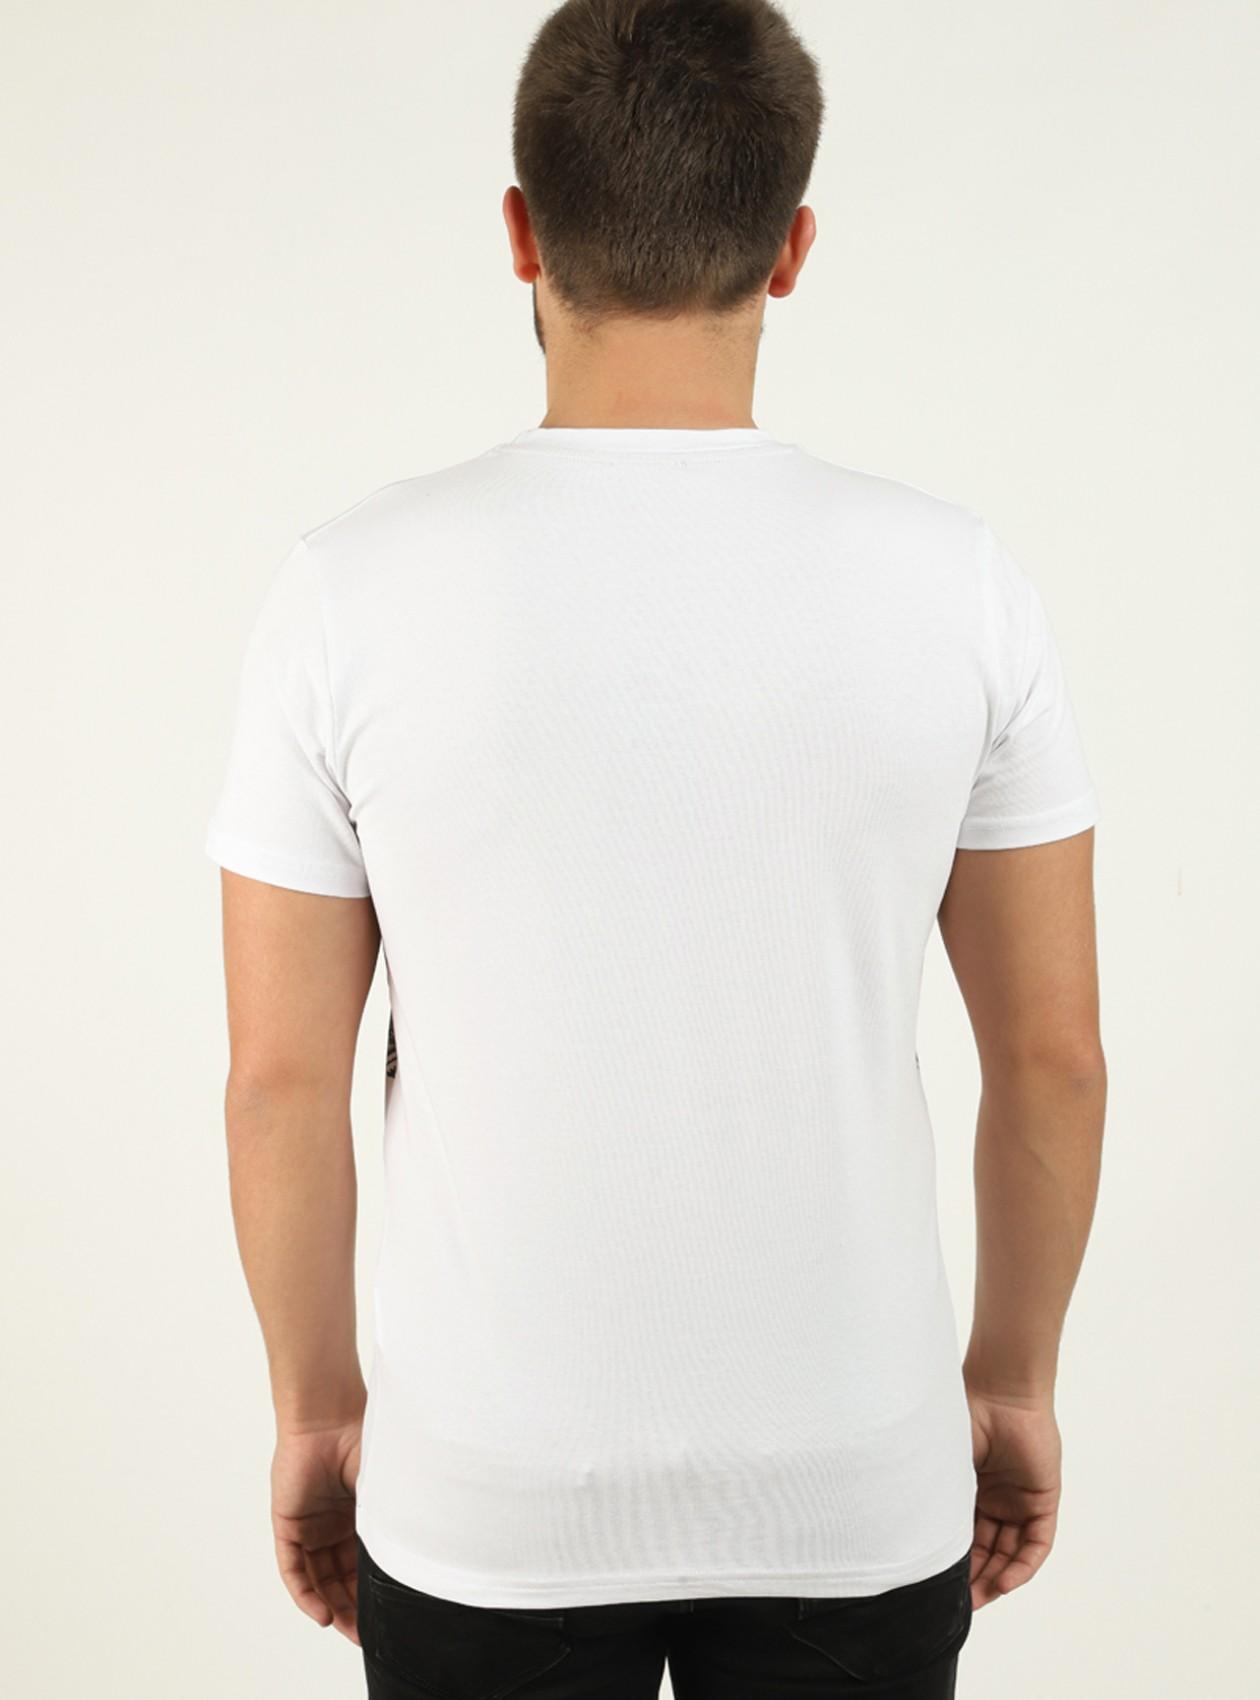 Tee-shirt homme Blanc avec bandes contrastantes